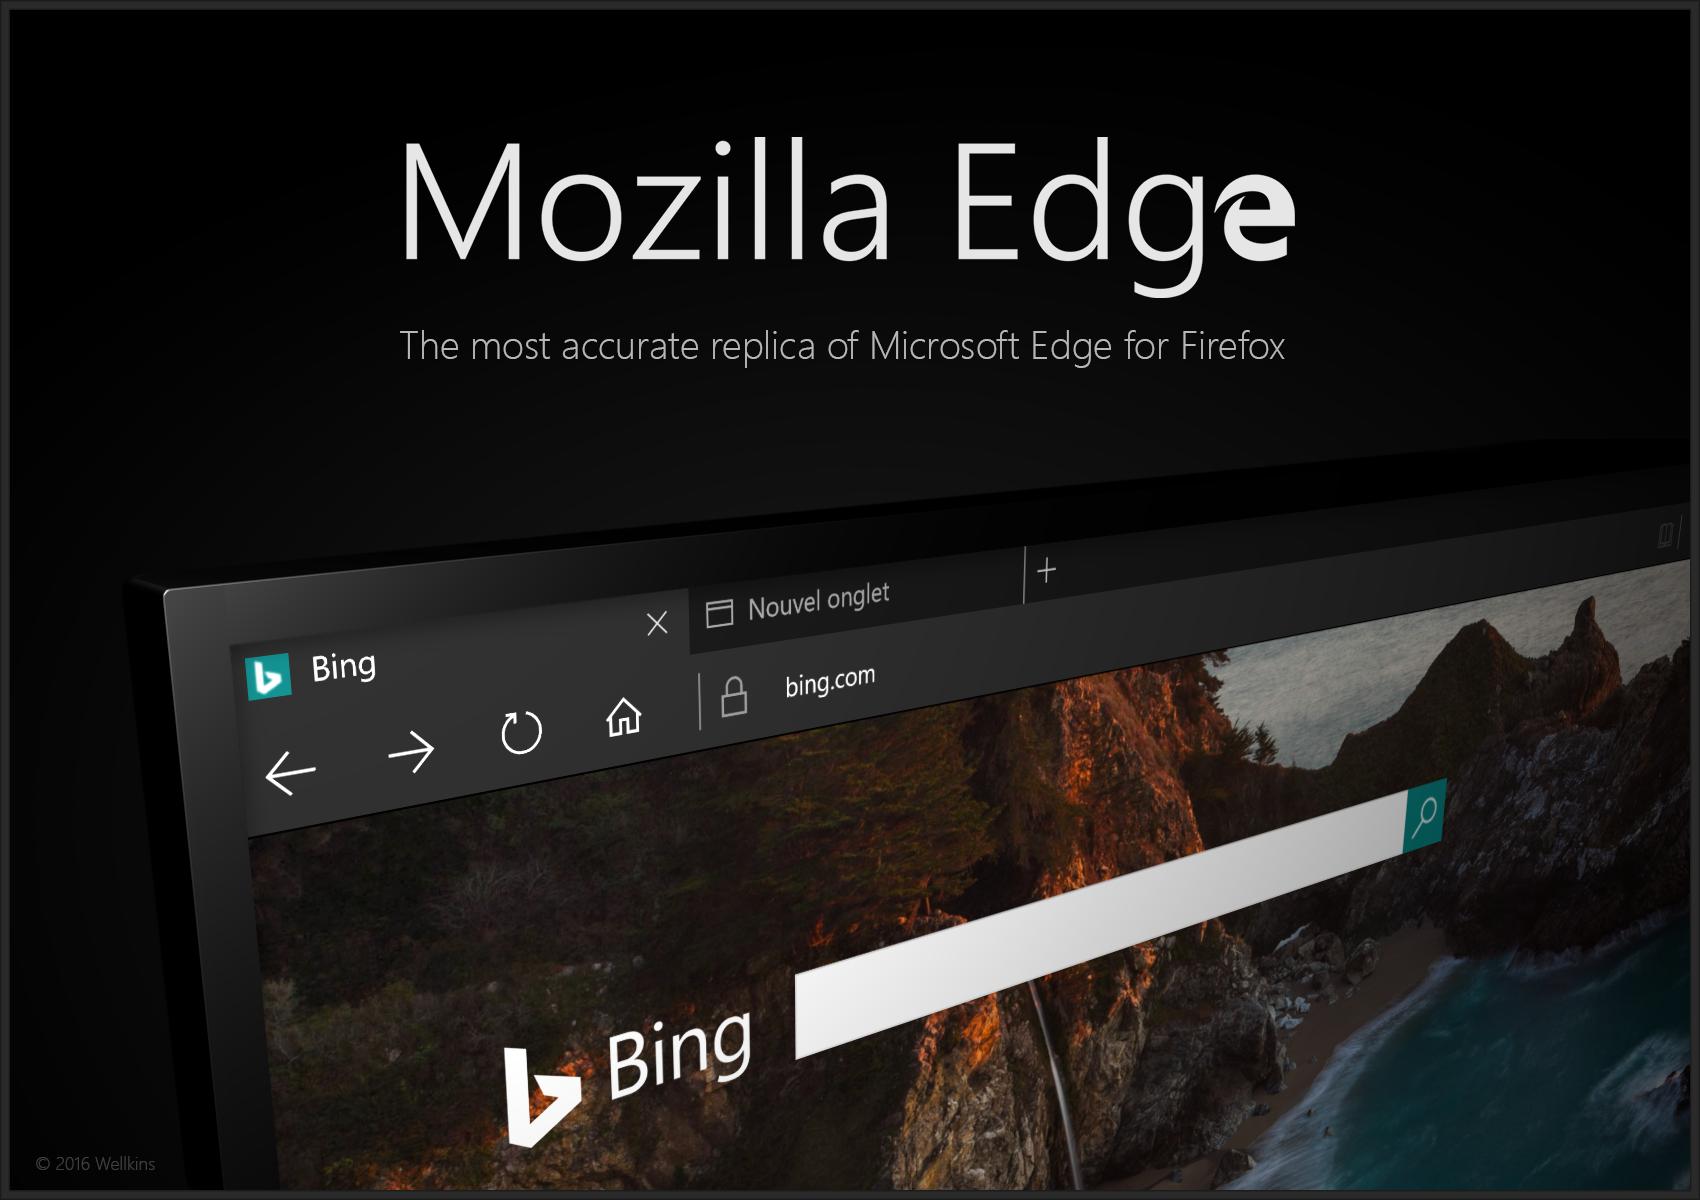 MOZILLA EDGE for Firefox